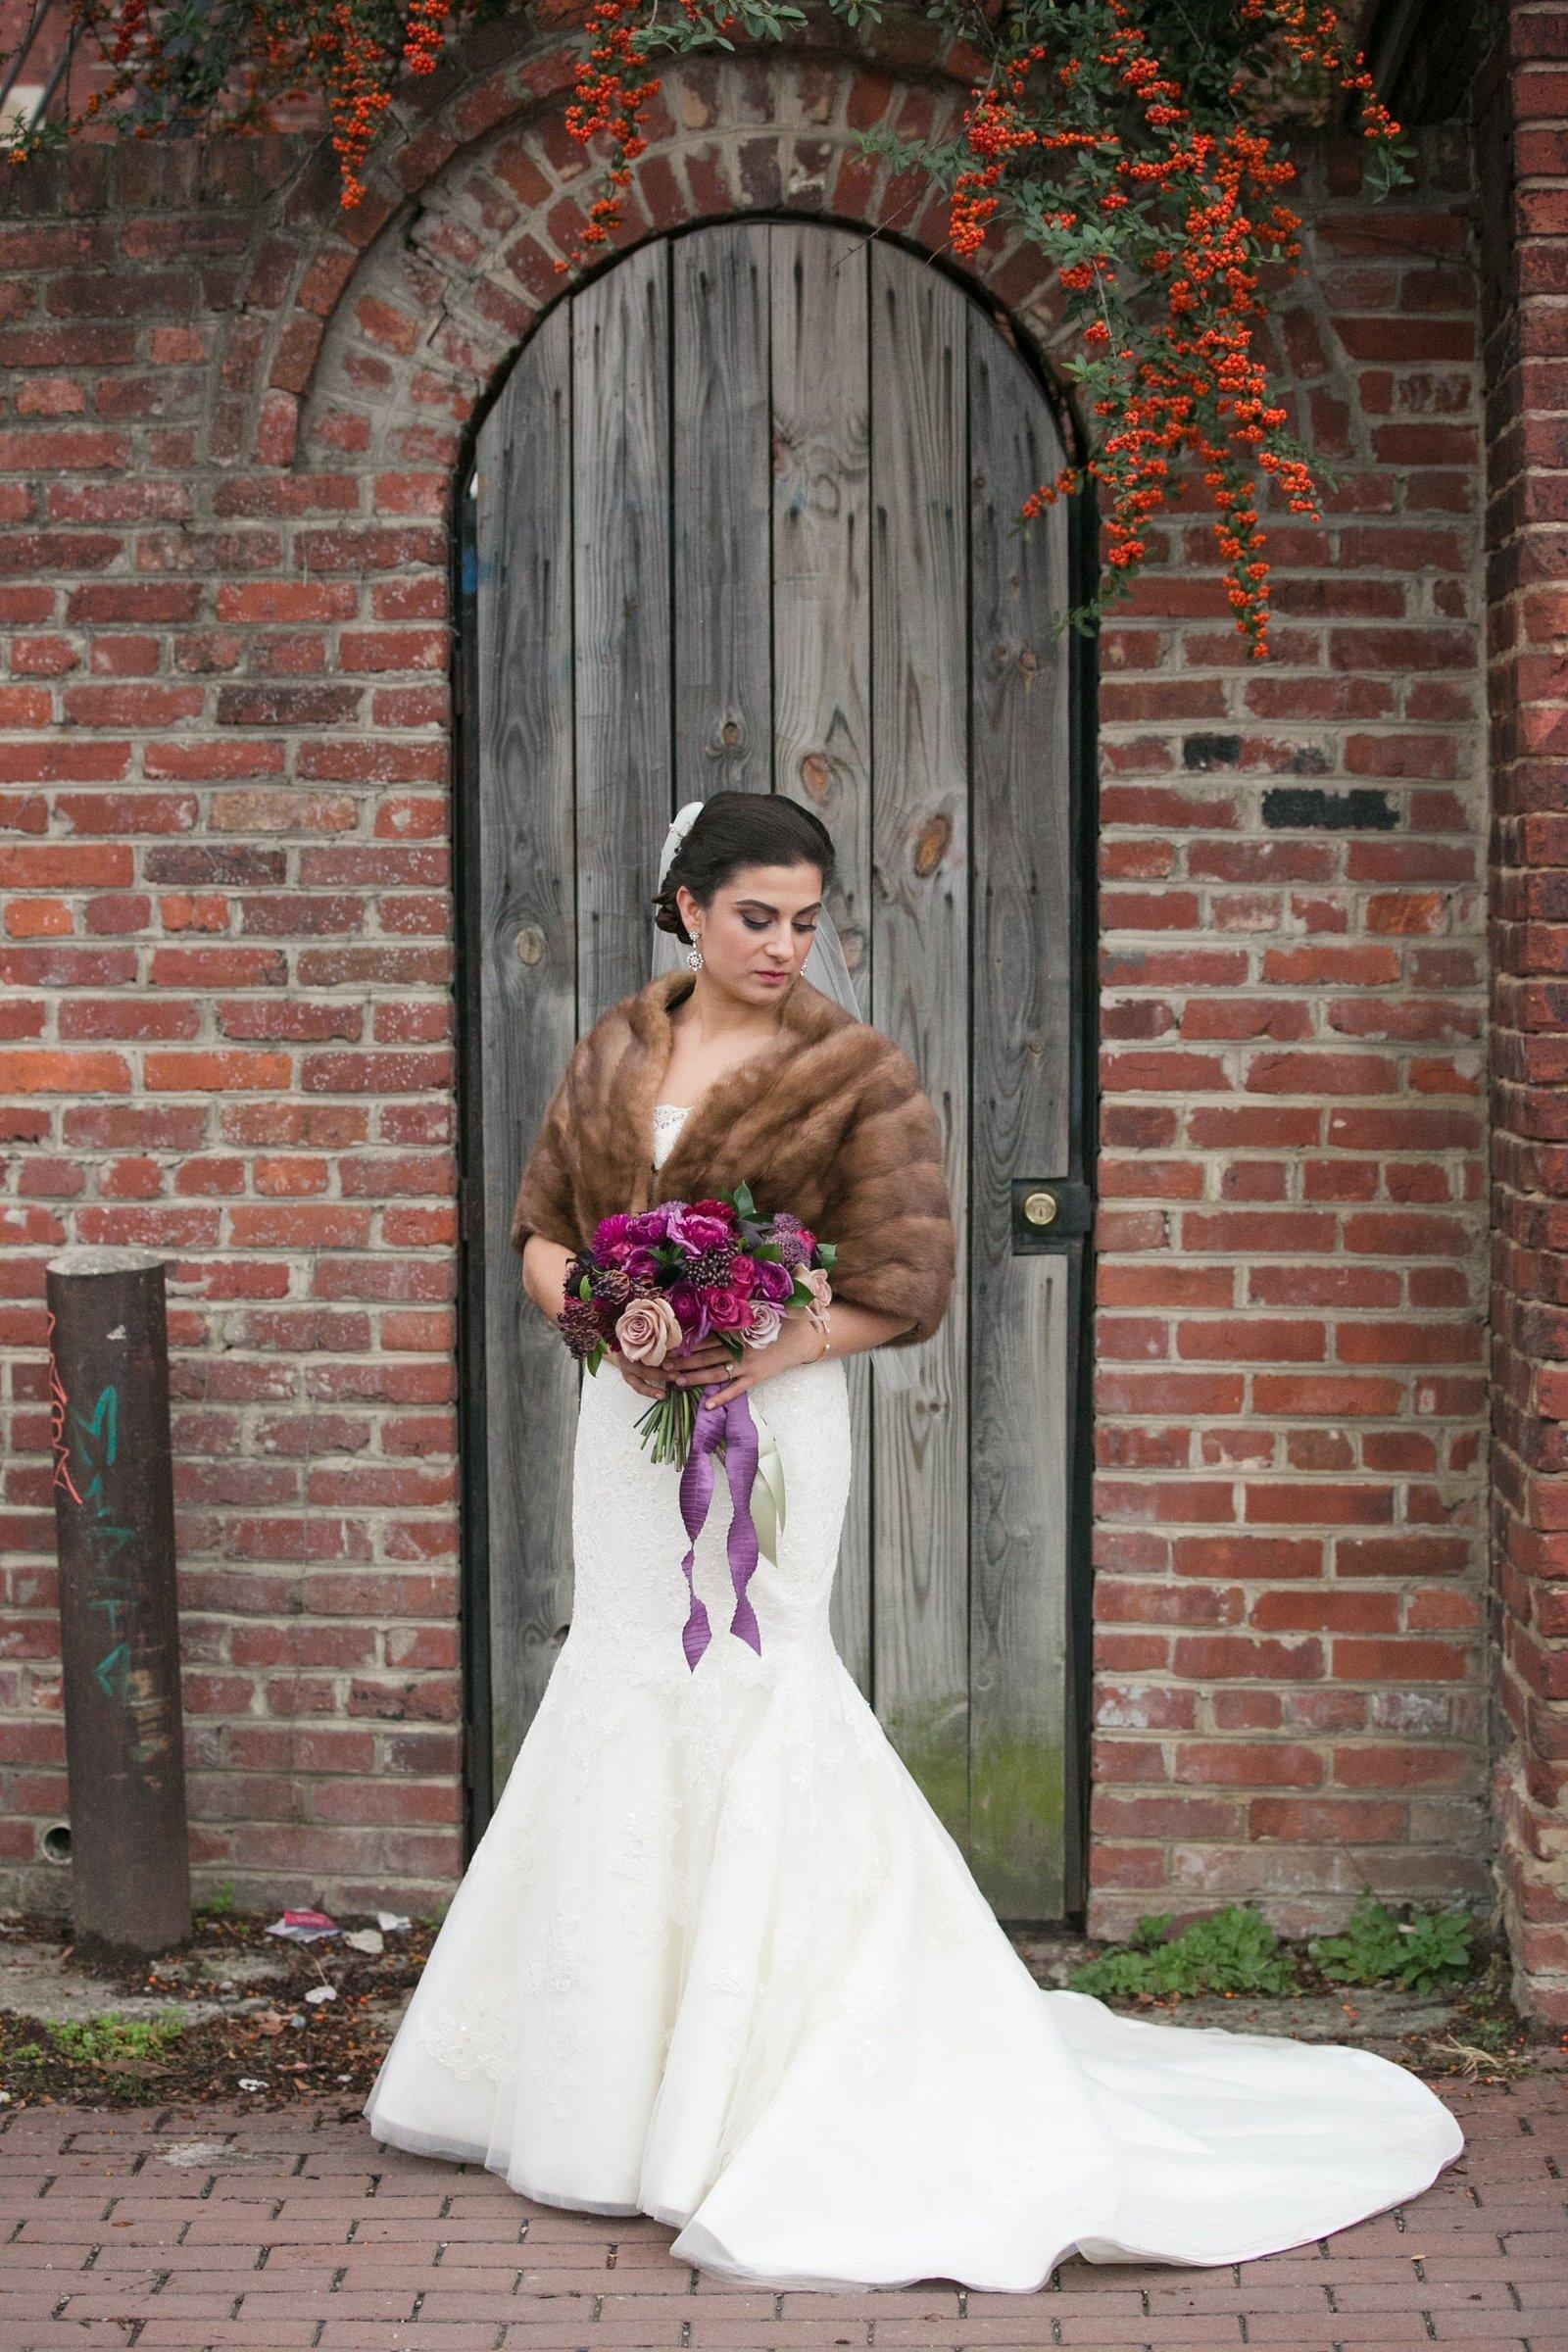 Black-tie-wedding-photos-longview-gallery-dc (155)